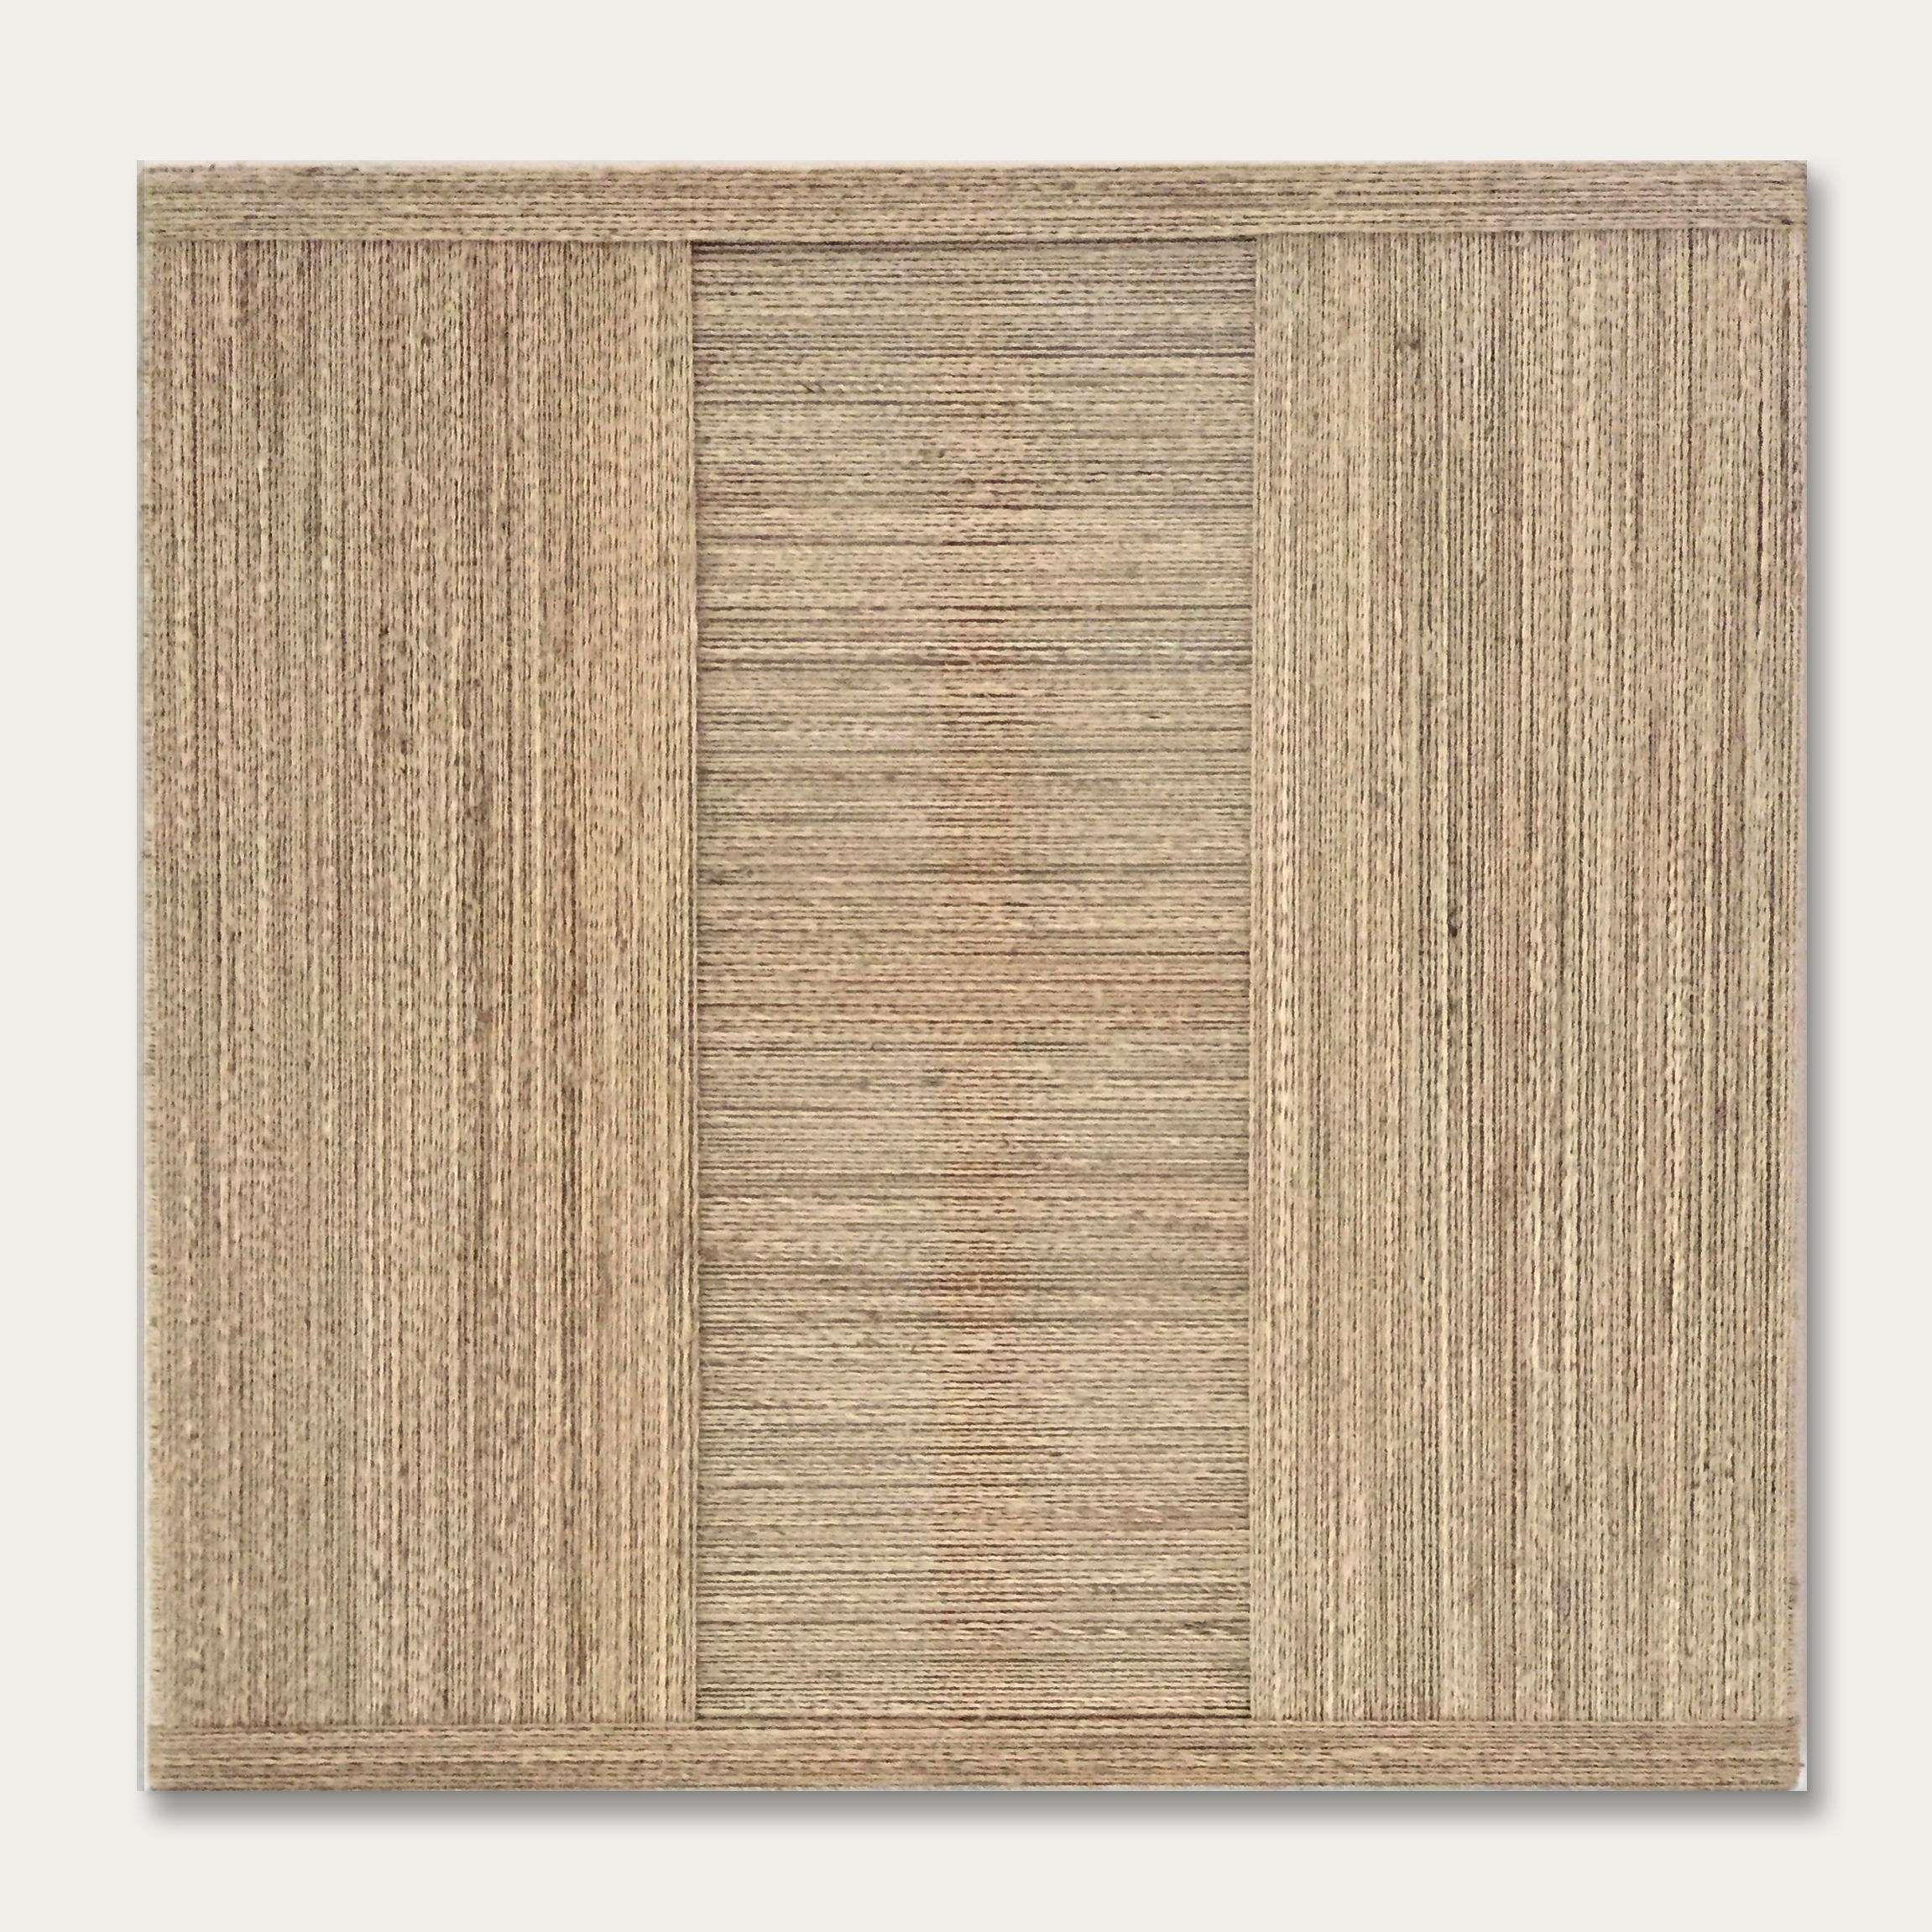 Untitled Pita Maguey 1 (thread, natural fiber, twine, Latin America, minimalist)